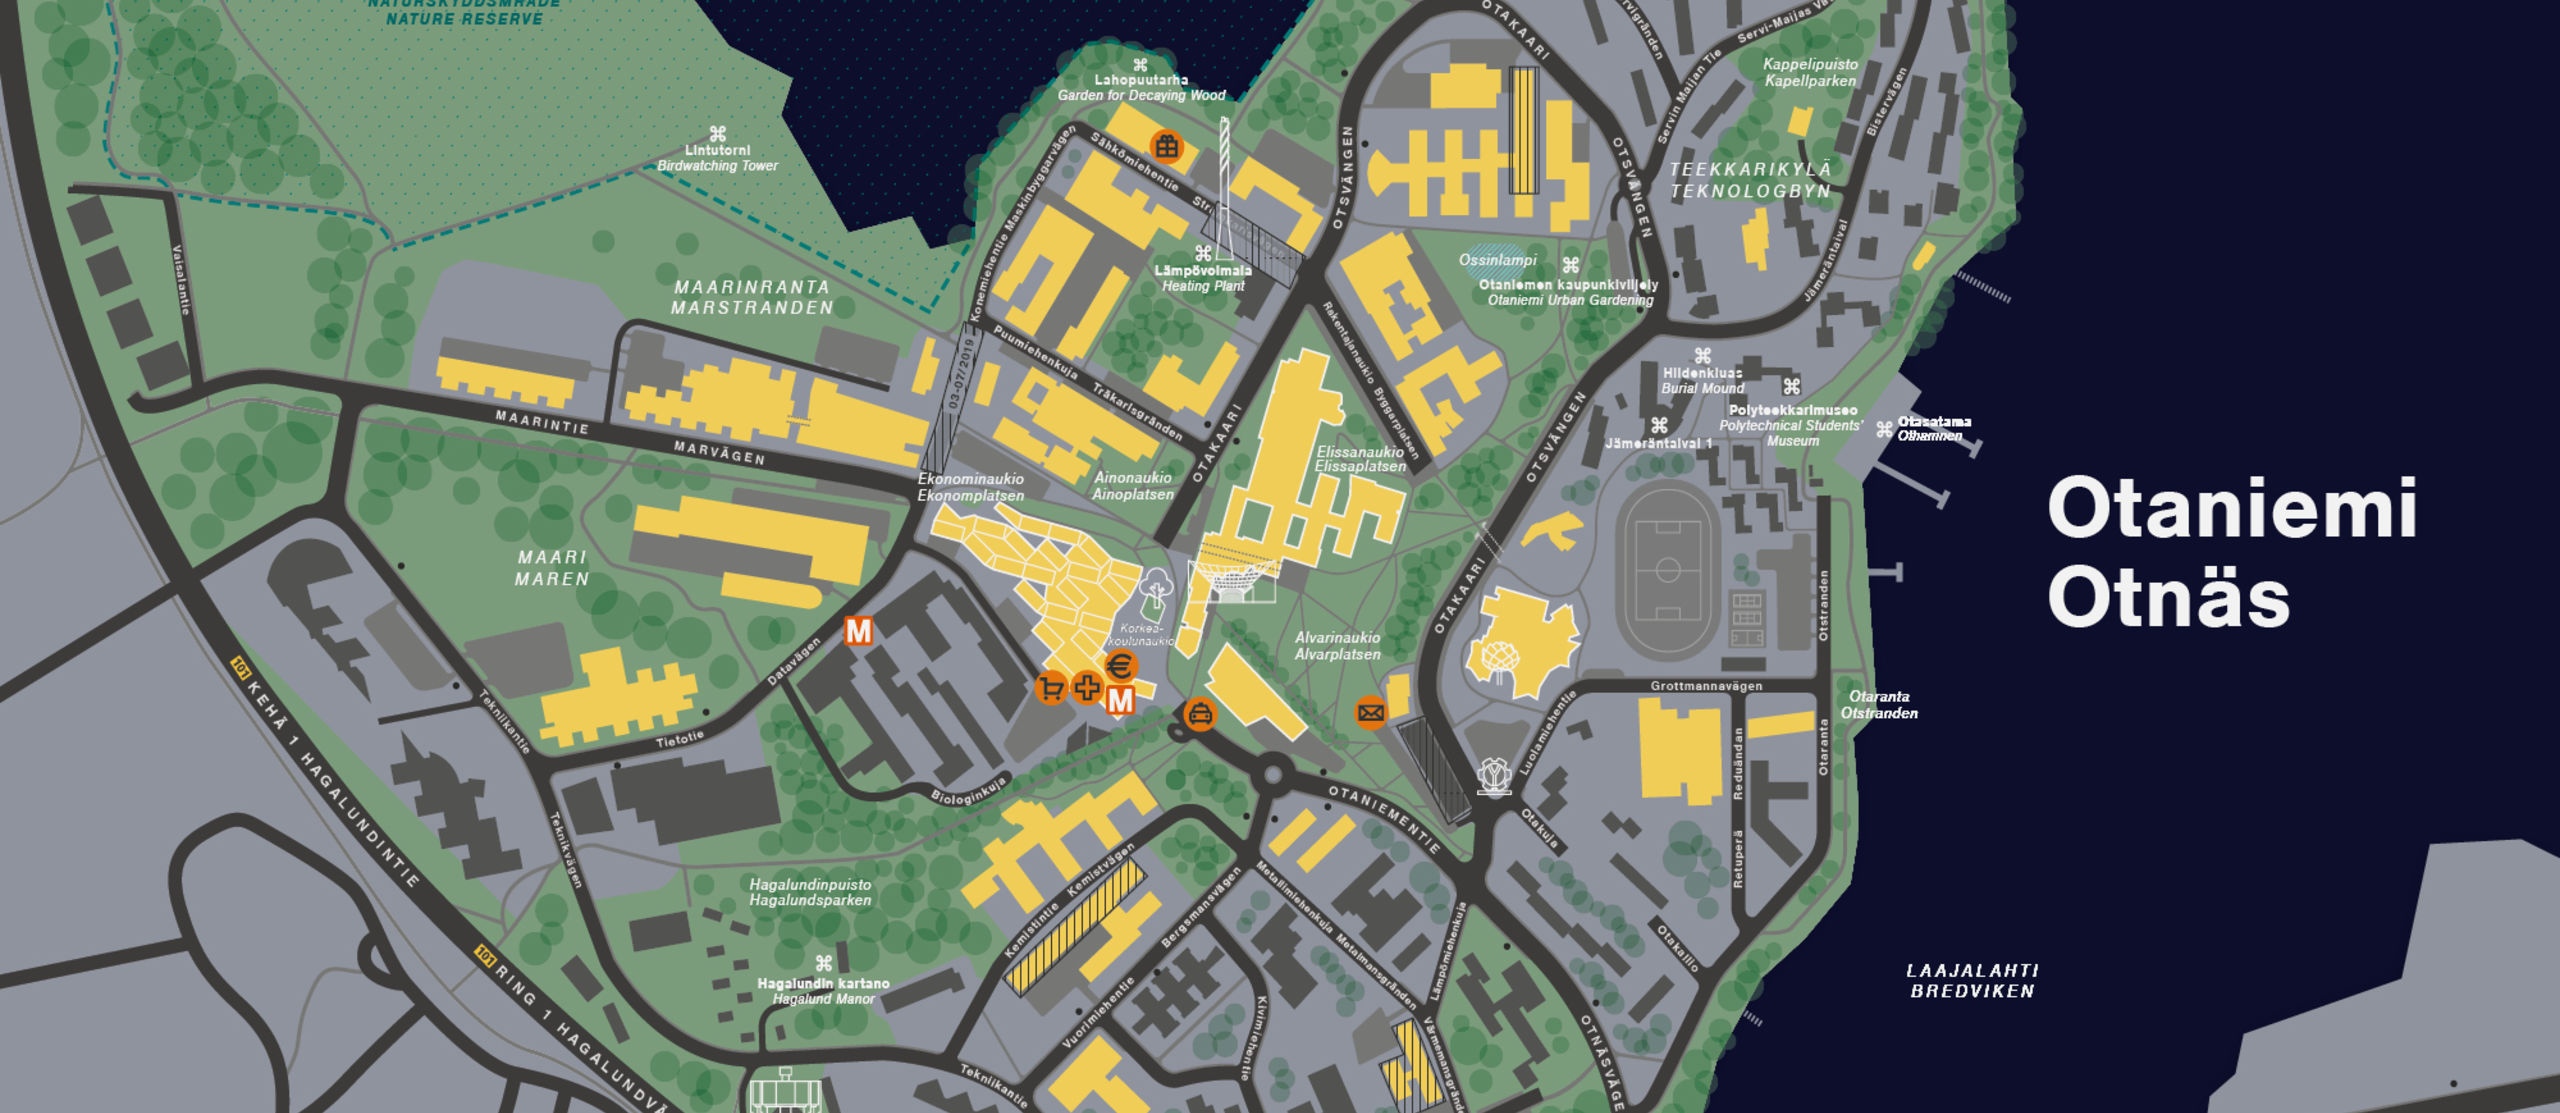 Saint Leo University Campus Map.Campus Maps And Getting To Otaniemi Aalto University